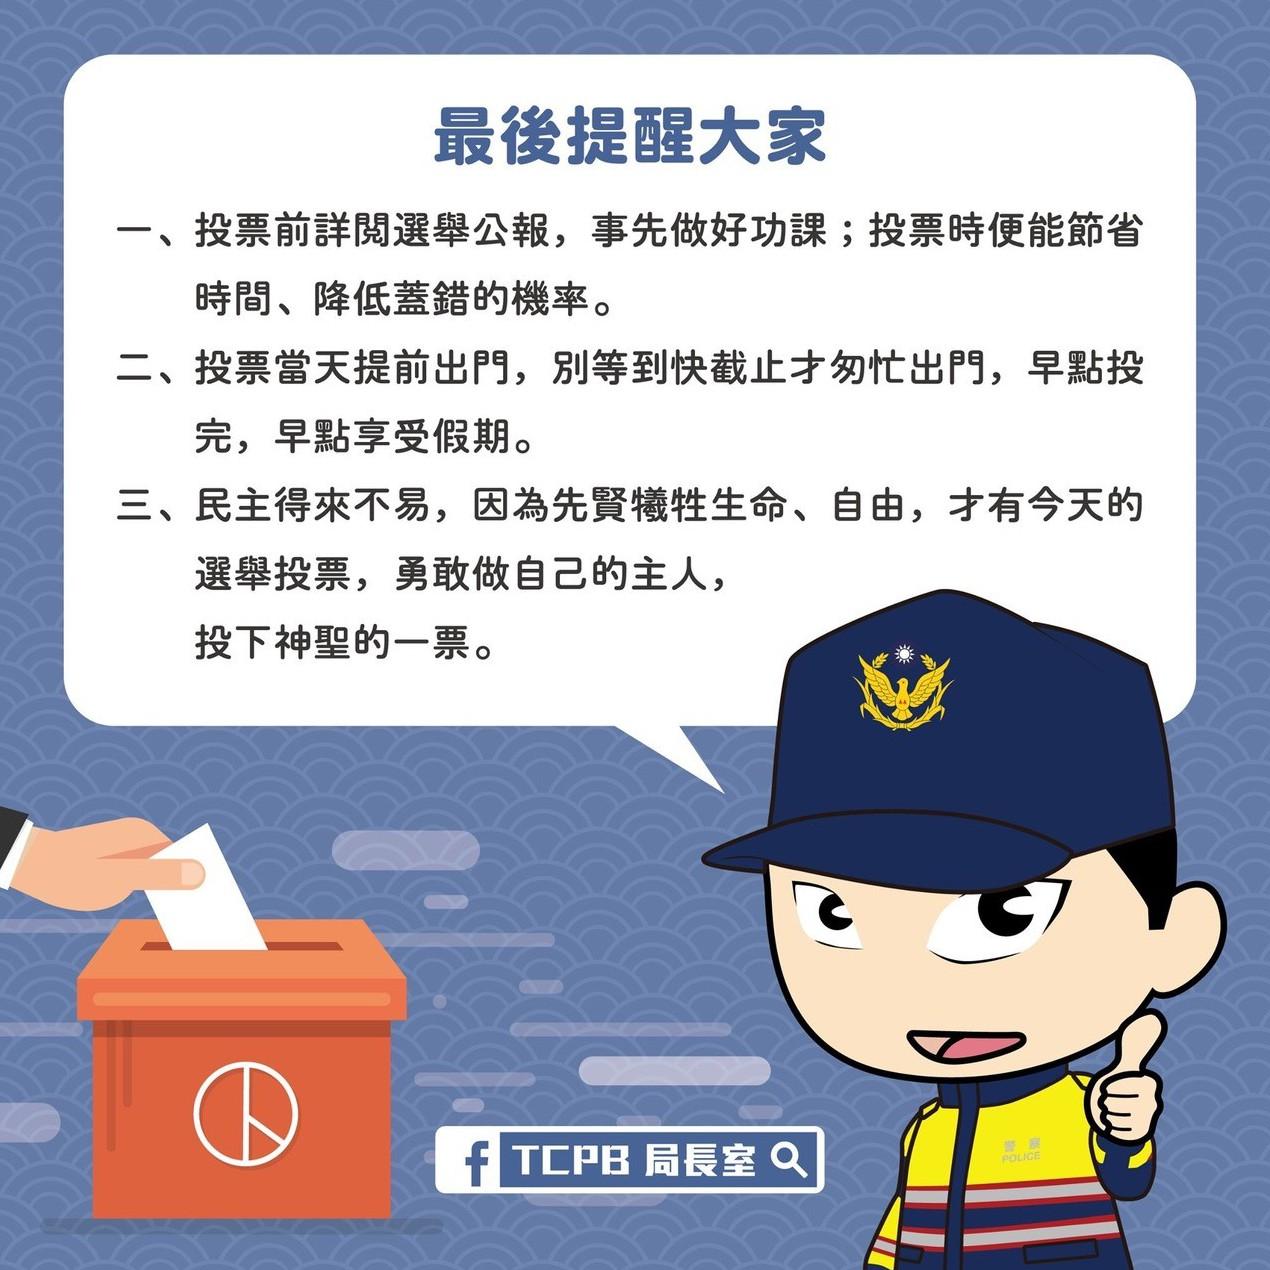 T小編提醒網友投票注意事項。 圖/擷取自TCPB局長室粉專